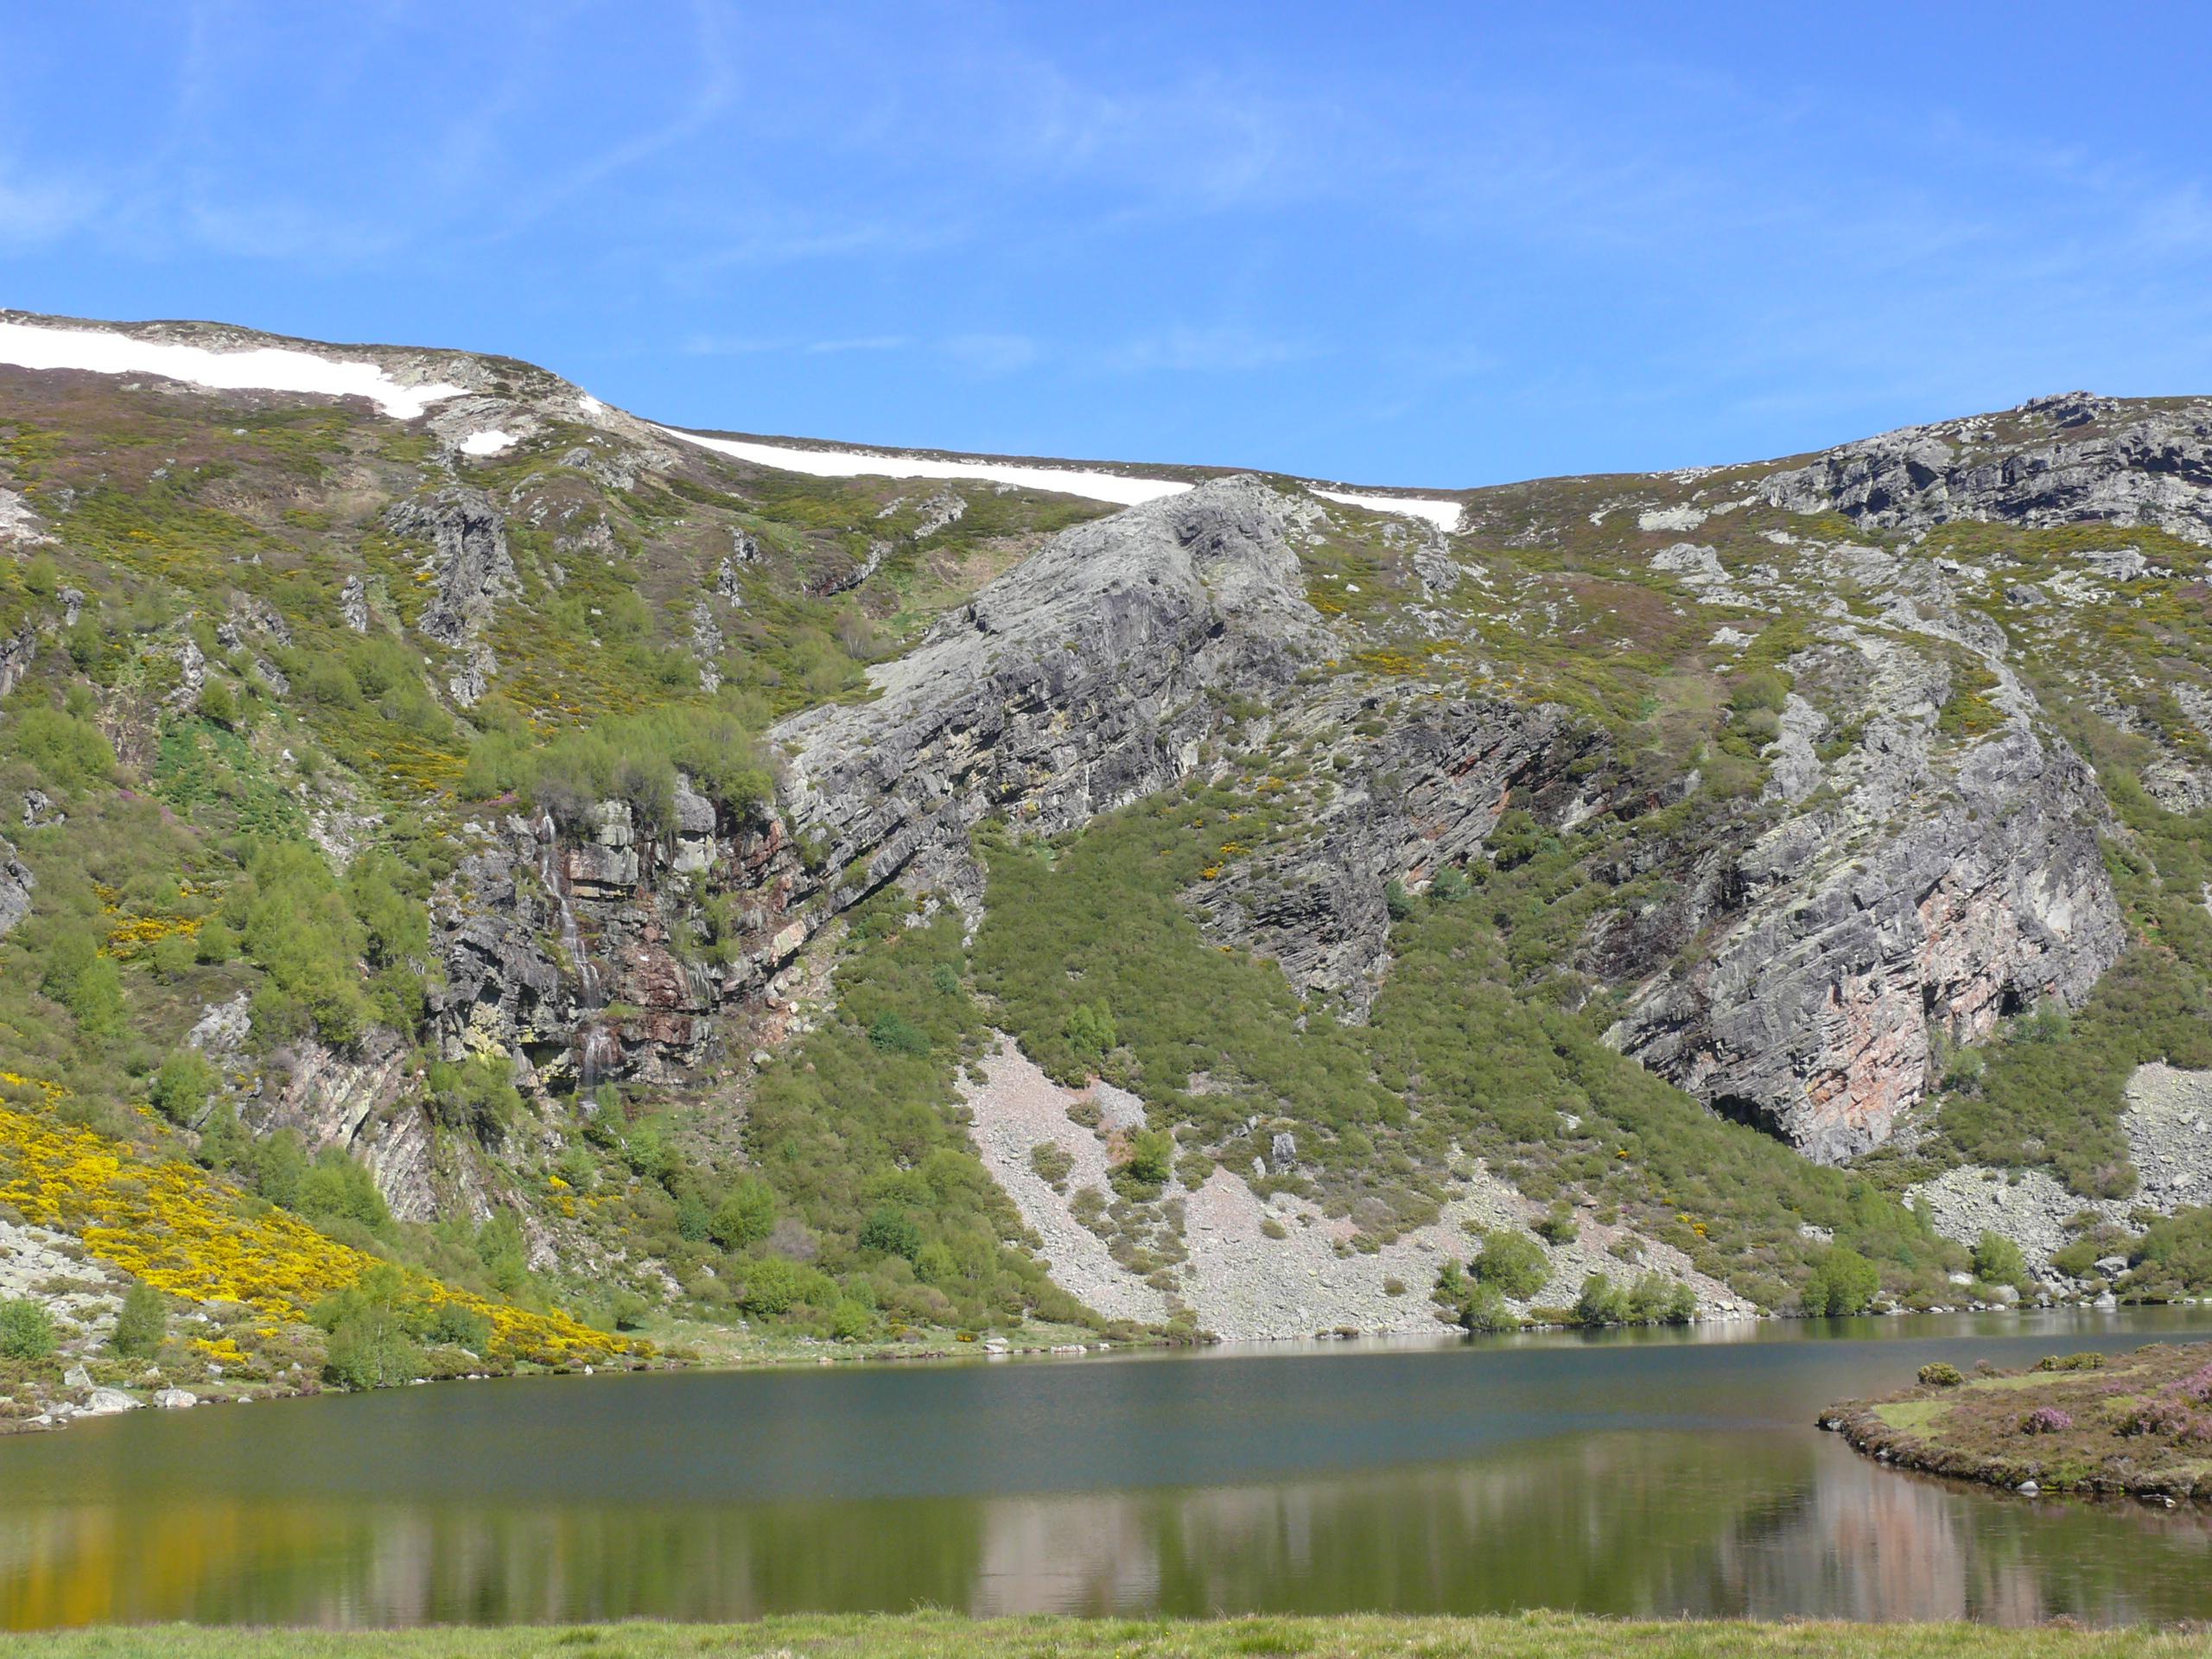 Monumento Natural 'Lago Truchillas'